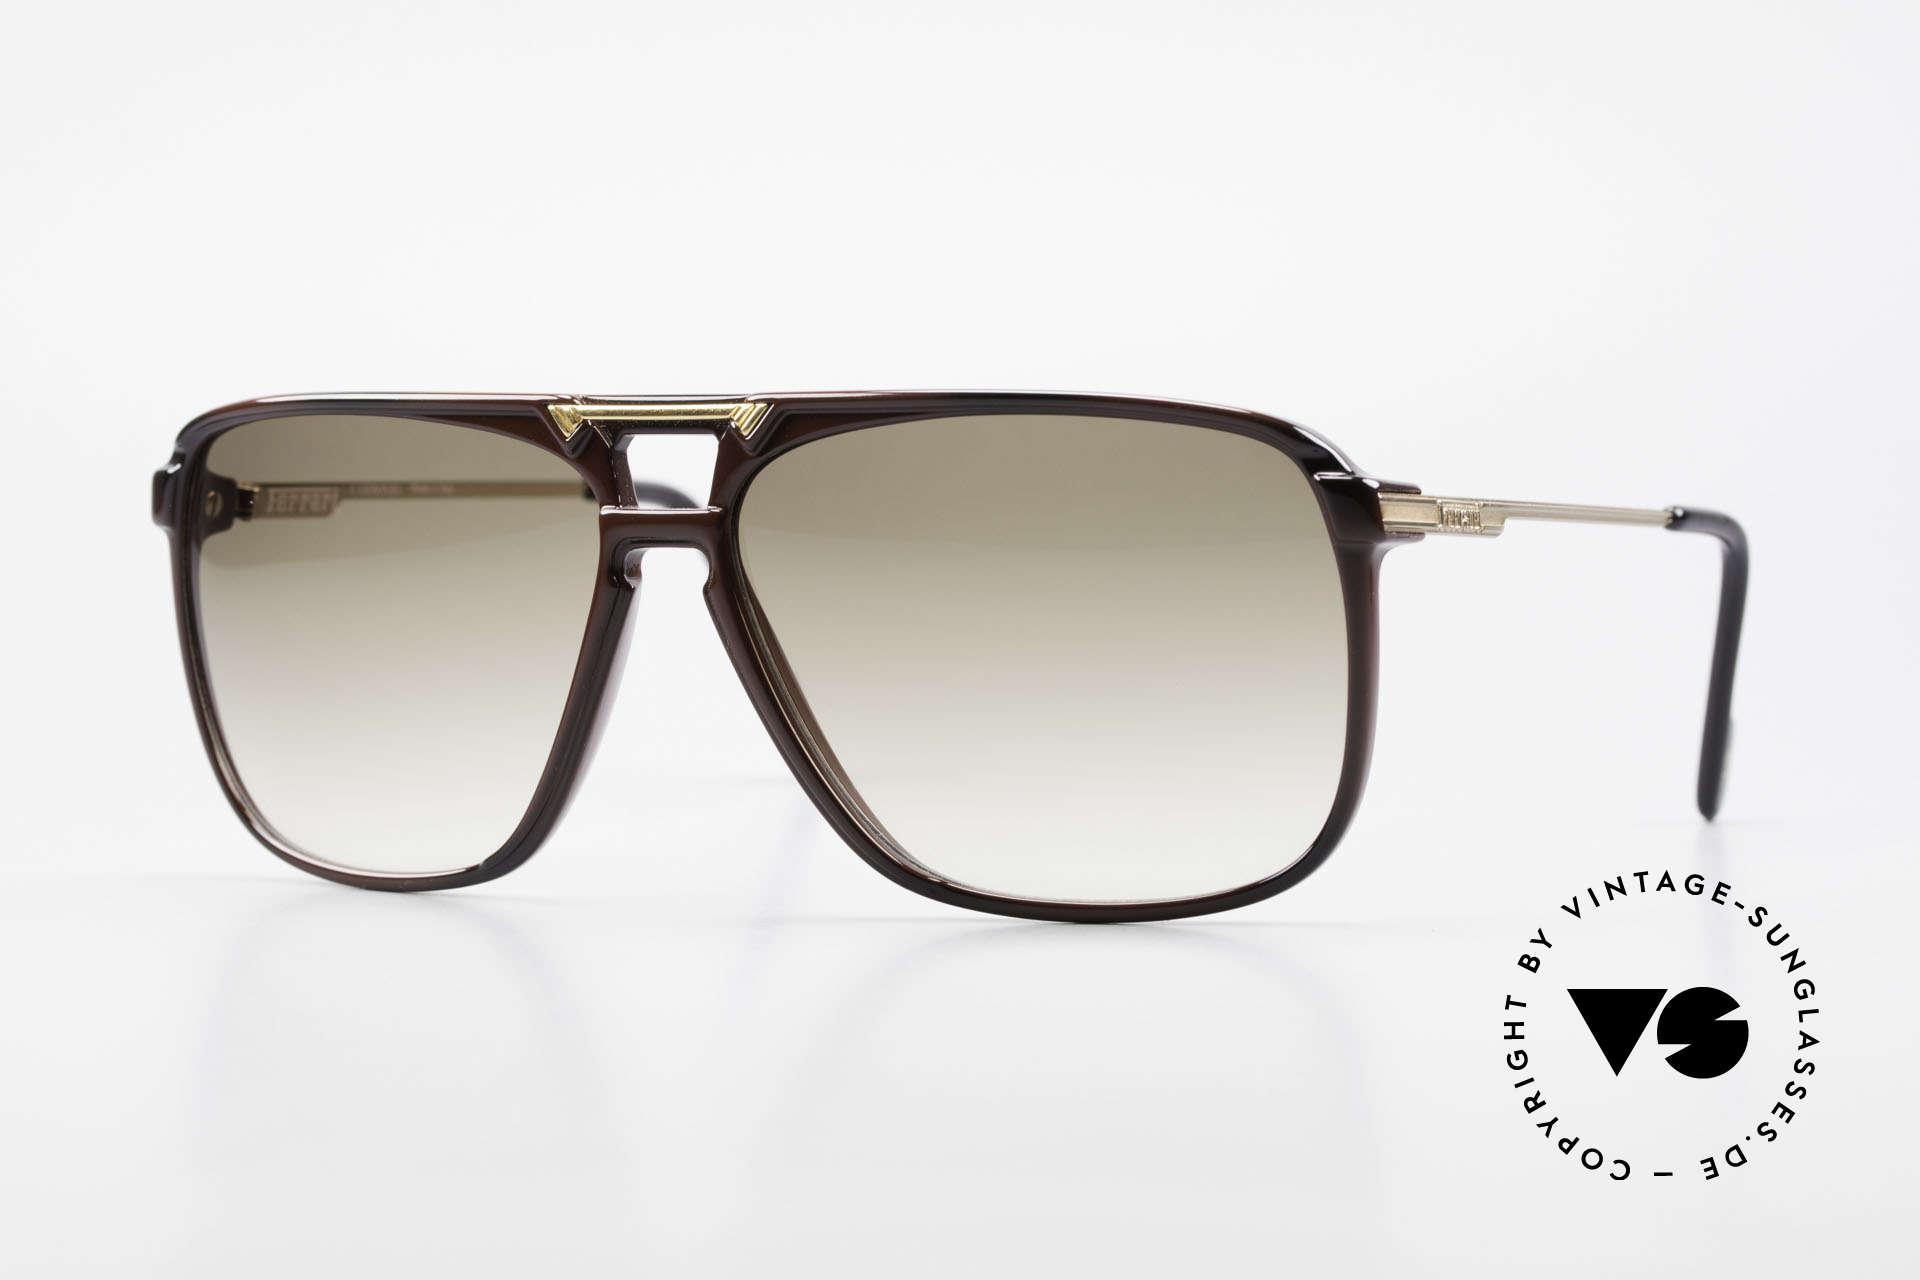 Ferrari F36/S Karbon Herren Sonnenbrille, vintage Ferrari Herren-Sonnenbrille aus den 90ern, Passend für Herren